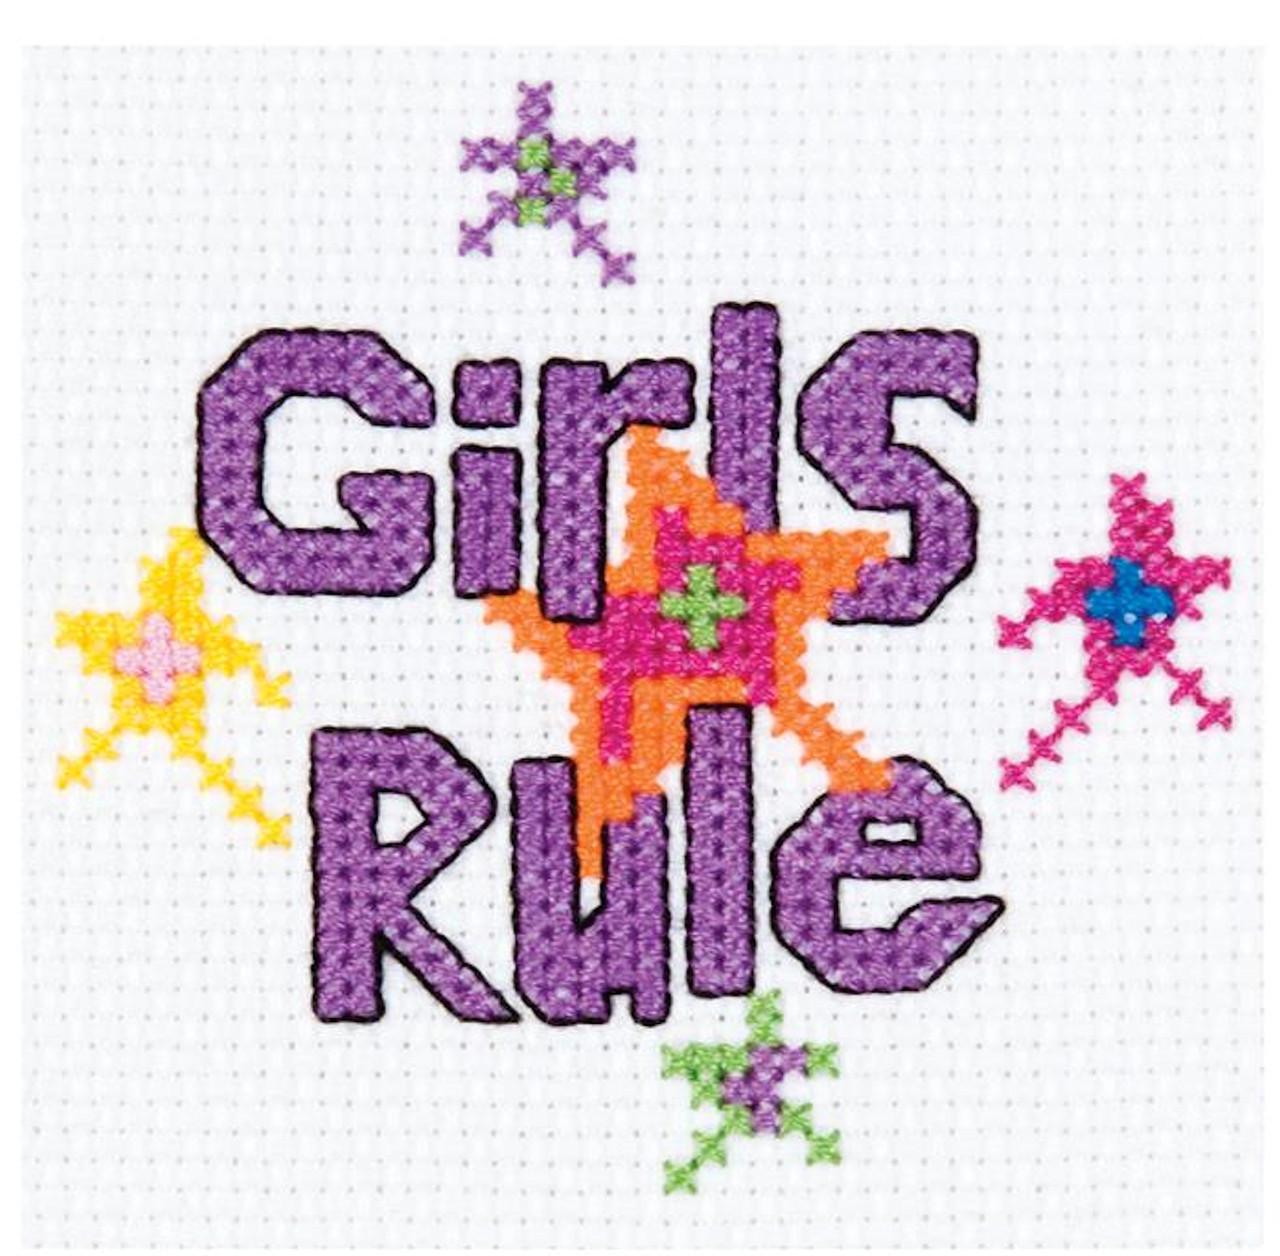 My 1st Stitch - Girls Rule